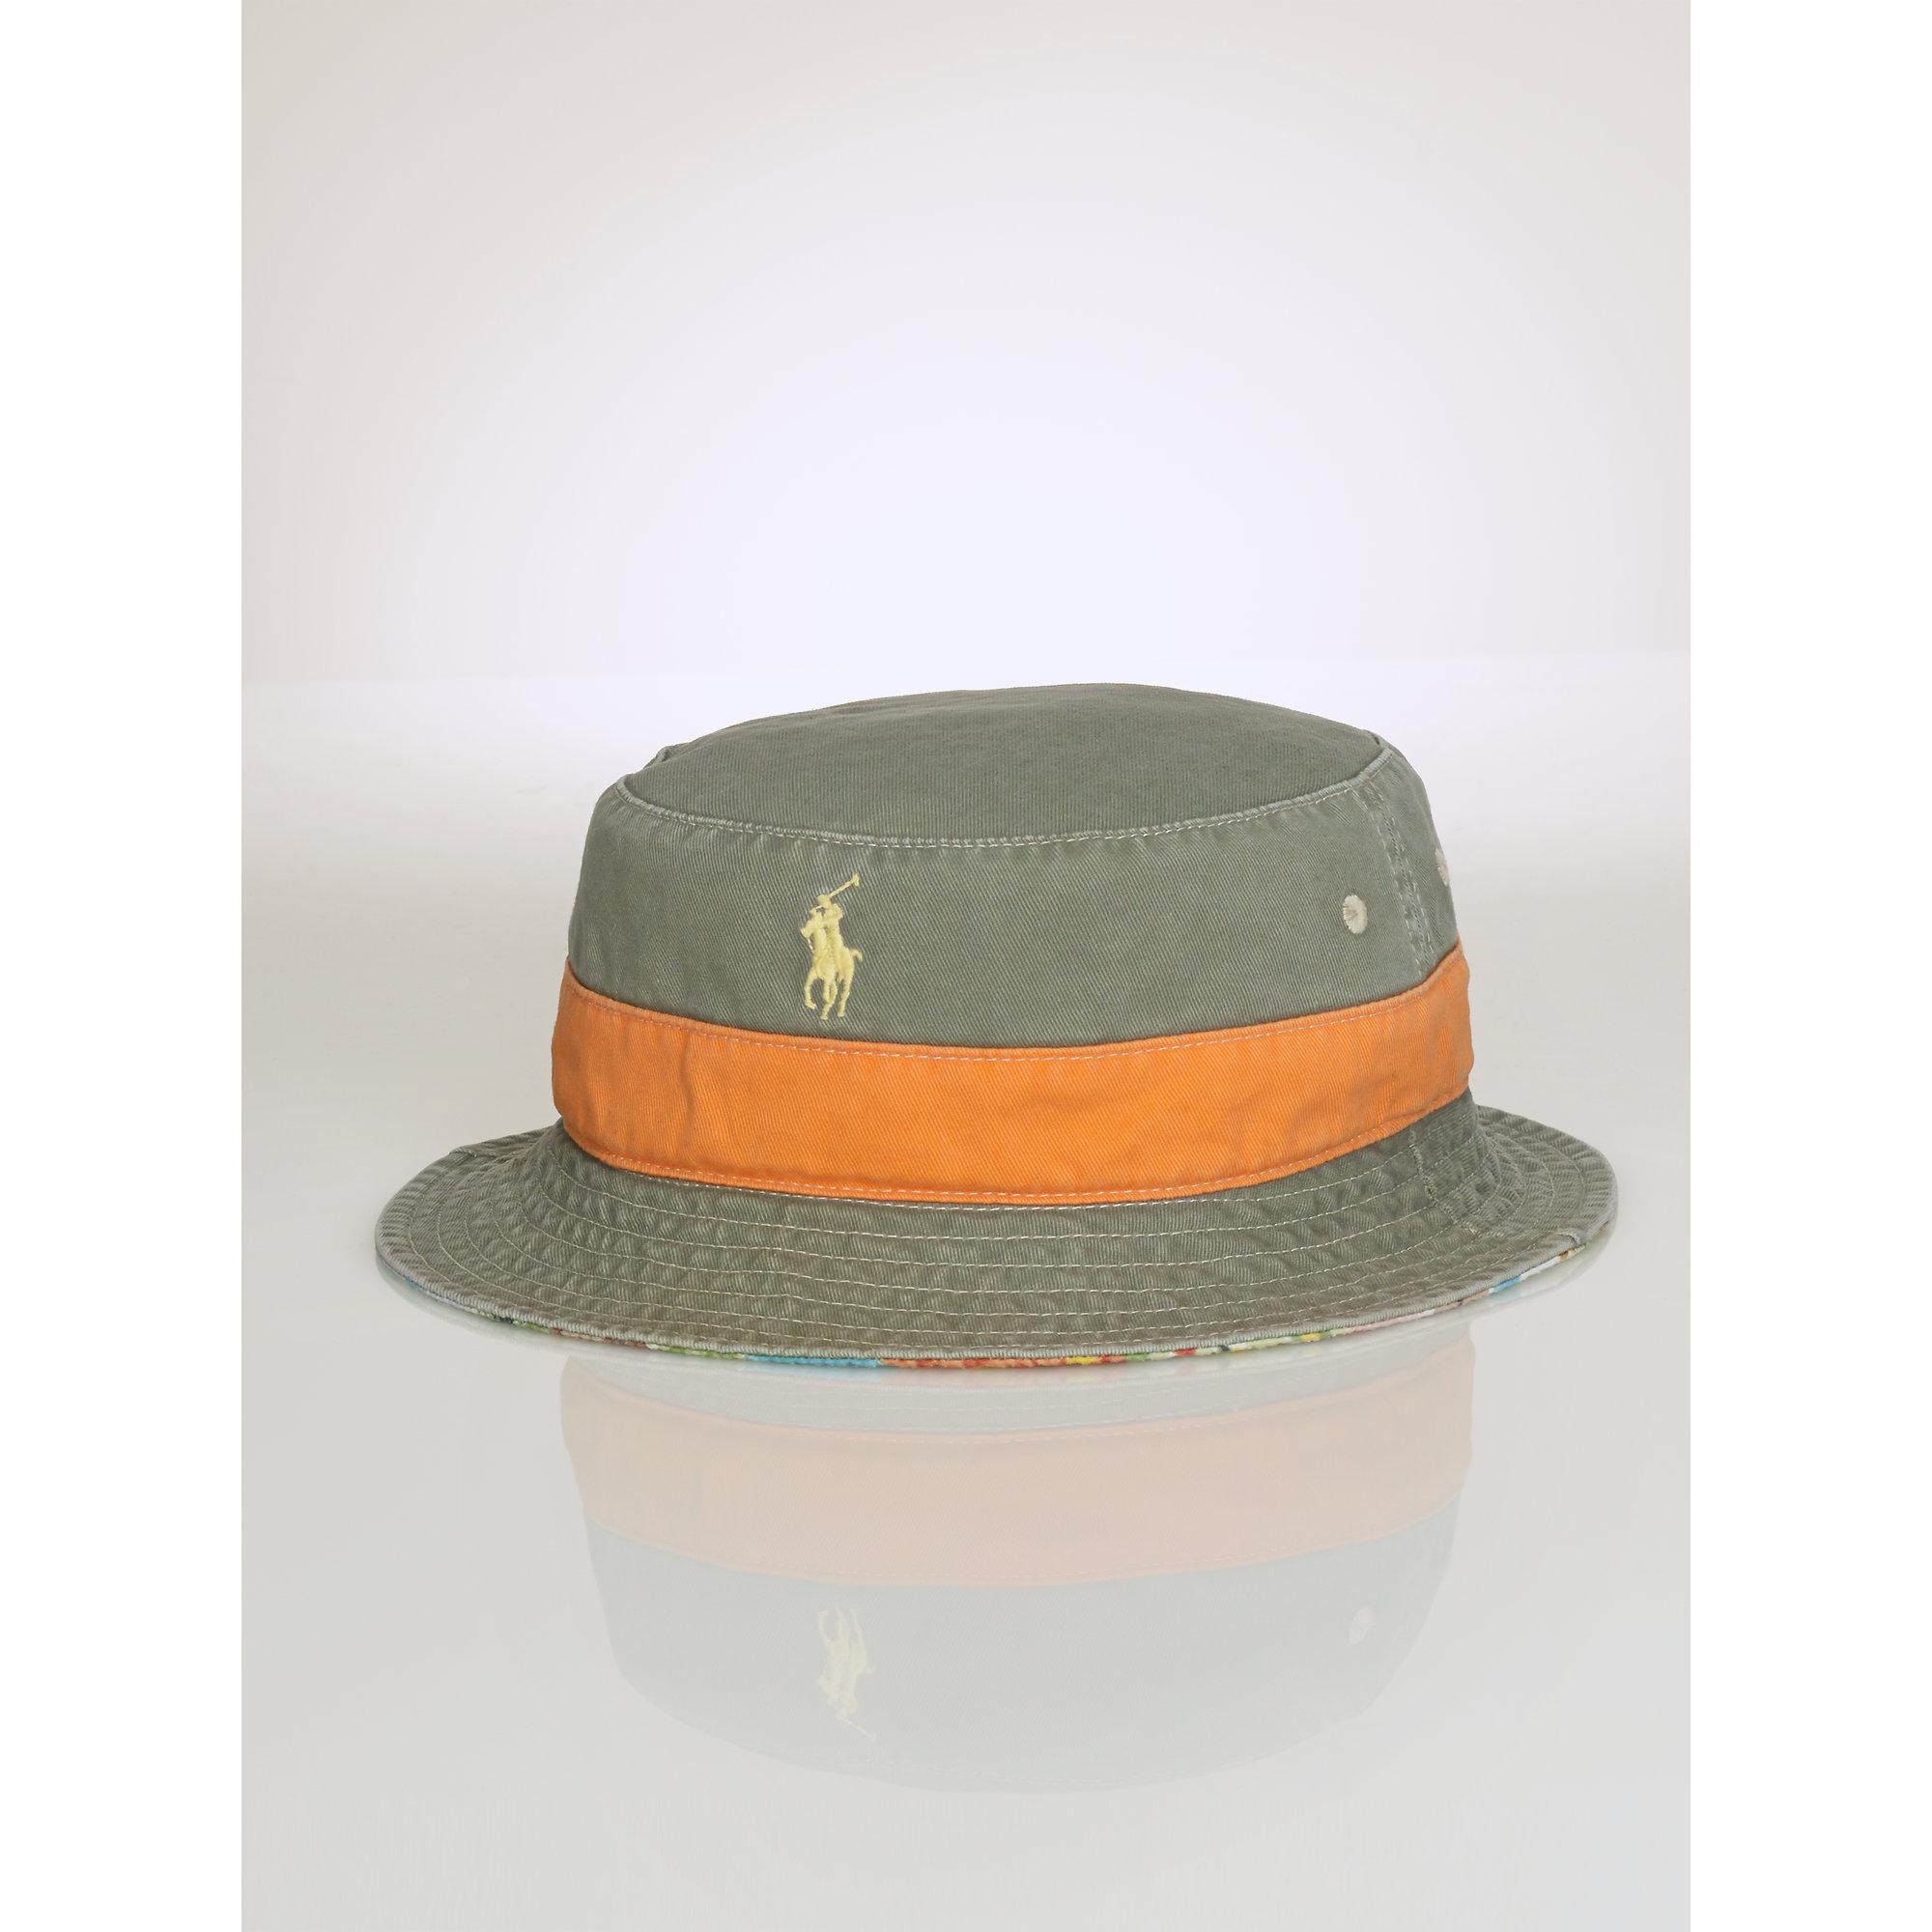 26e7ade362e Lyst - Polo Ralph Lauren Reversible Hawaiian Bucket Hat in Blue for Men